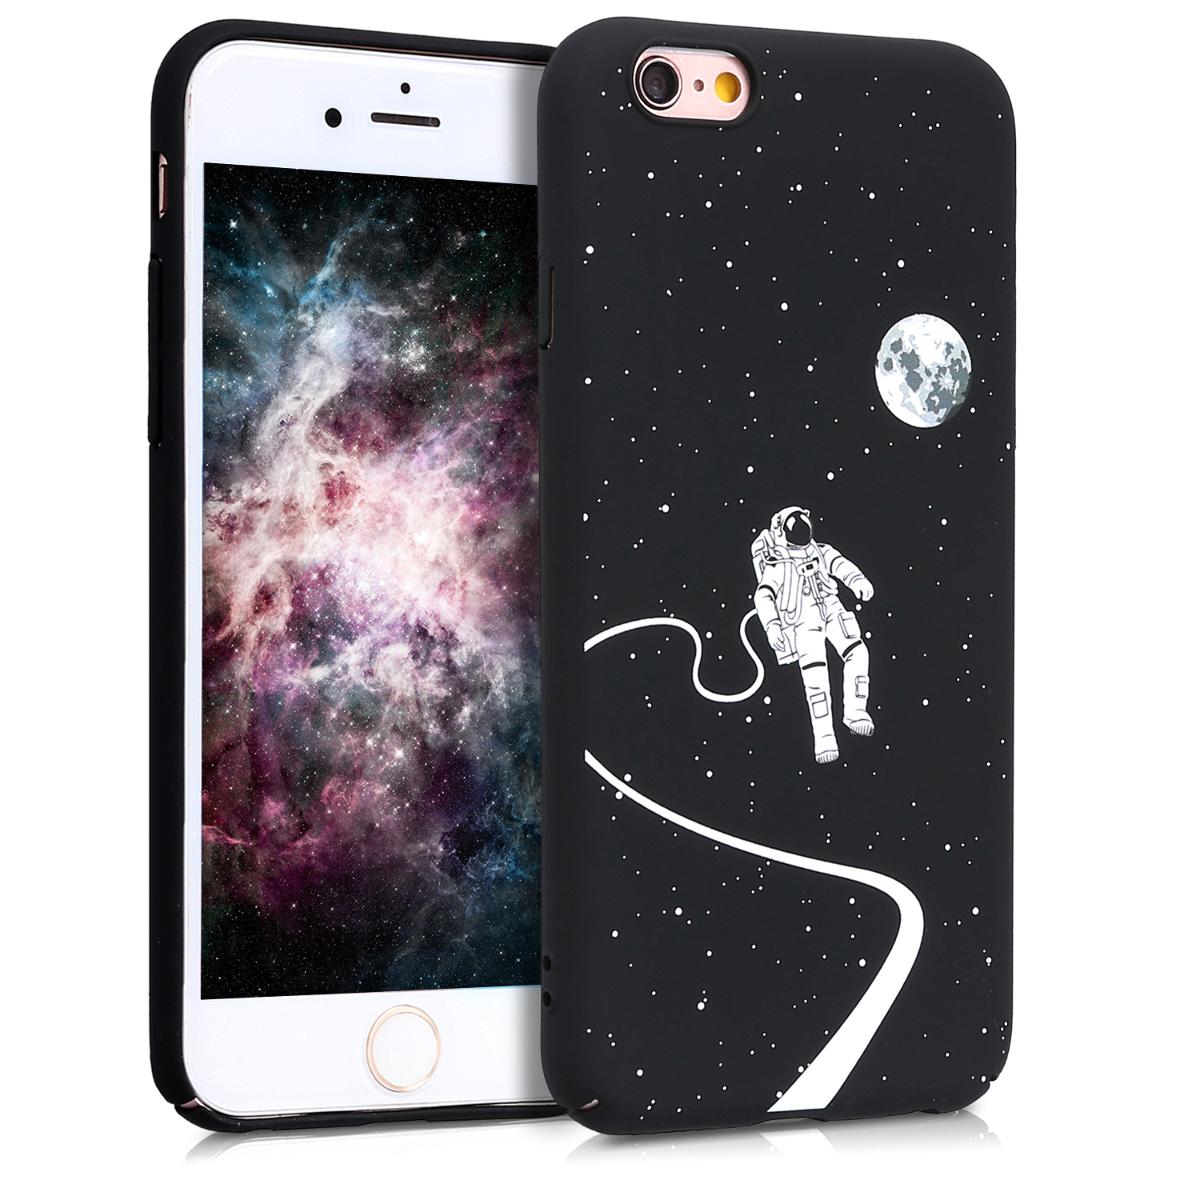 KW Slim Anti-Slip Cover - Σκληρή Θήκη Καουτσούκ iPhone 6 / 6S - Μαύρο - Αστροναύτης (44140.03)